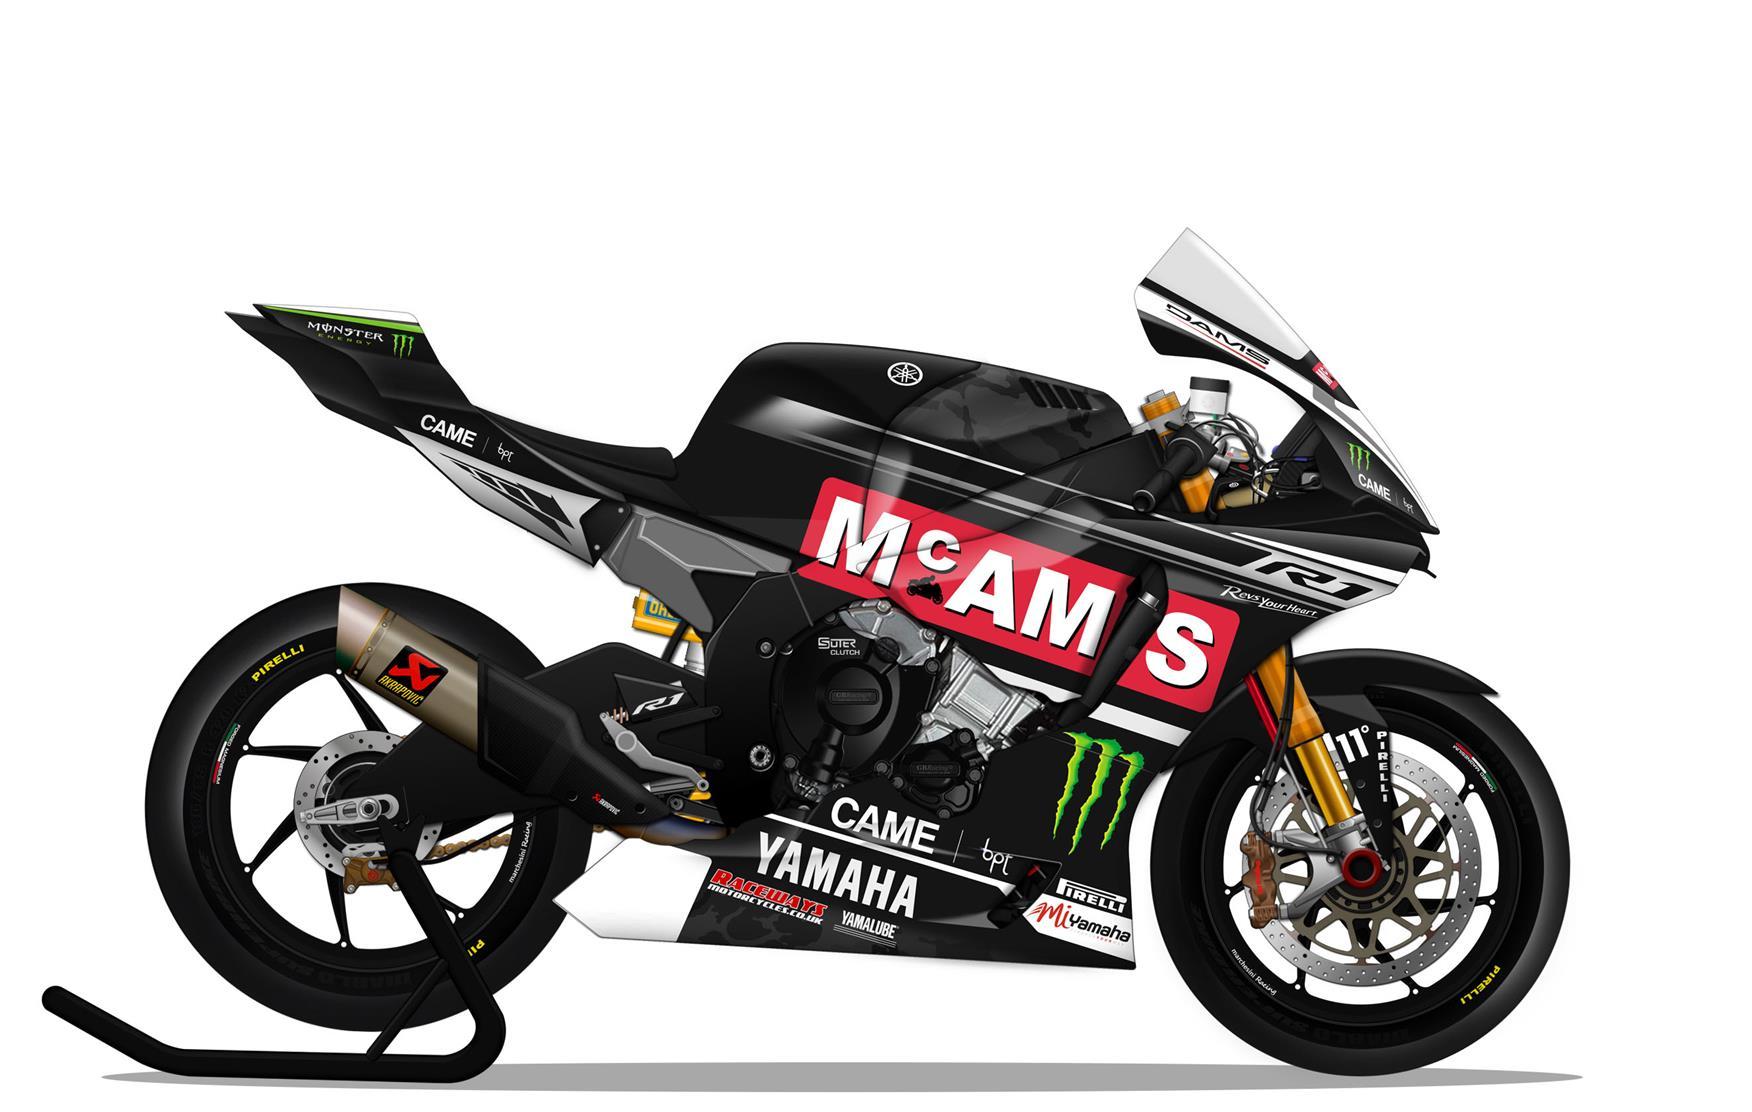 Mcams Yamaha Supersport